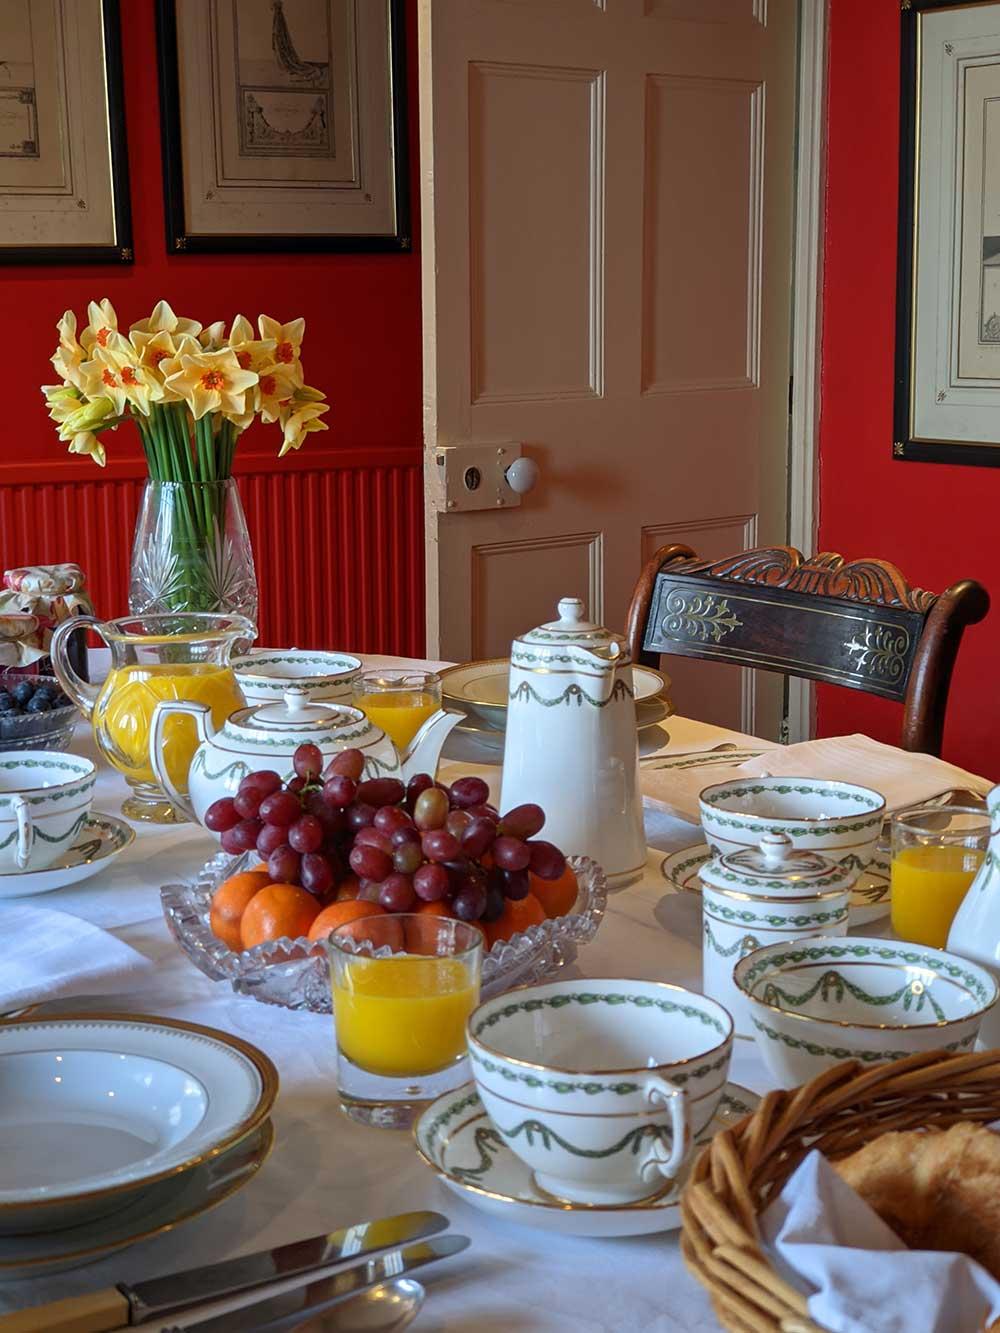 Breakfast of croissants, orange juice and fruit